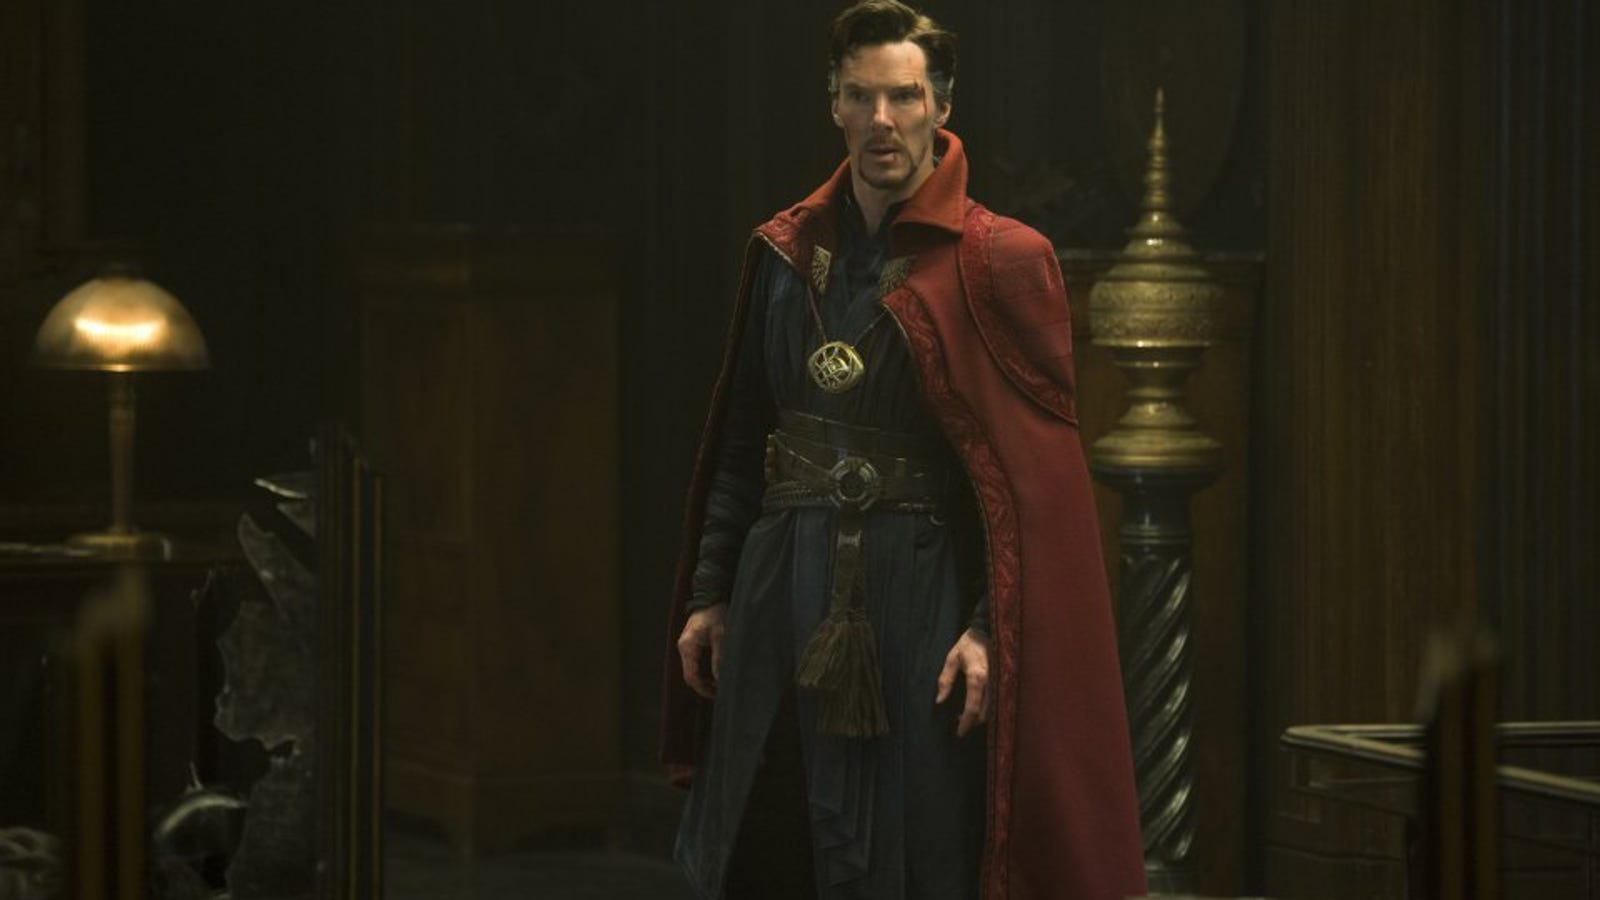 Sí, Doctor Strange reveló el título de la nueva Avengers: Endgame durante Avengers: Infinity War